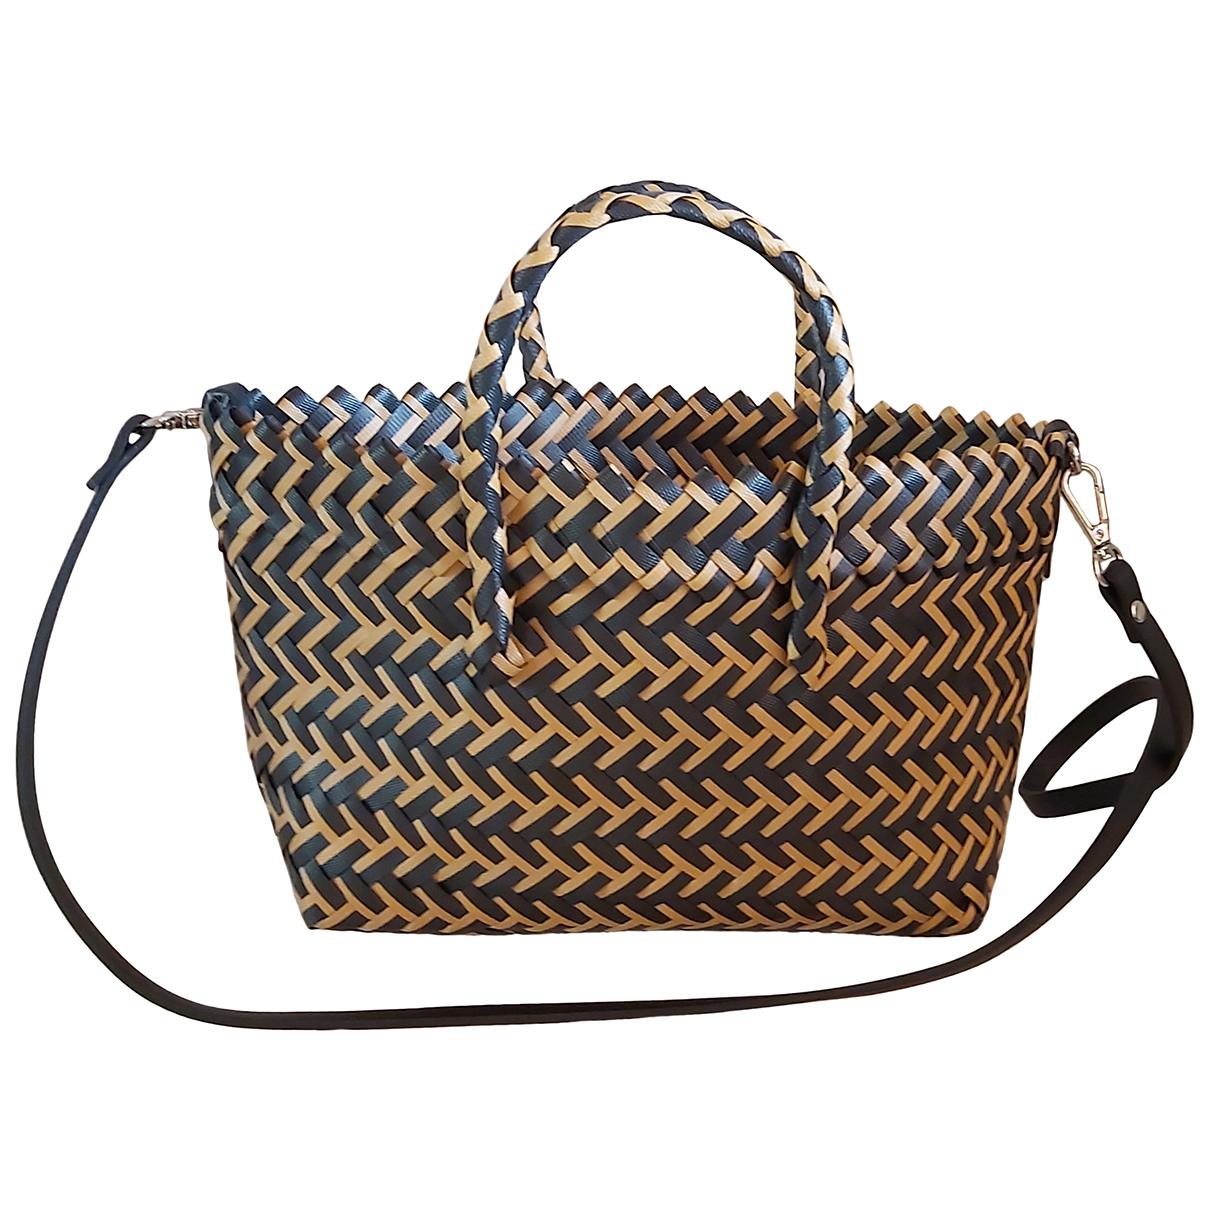 Zara \N Handtasche in  Kamel Synthetik